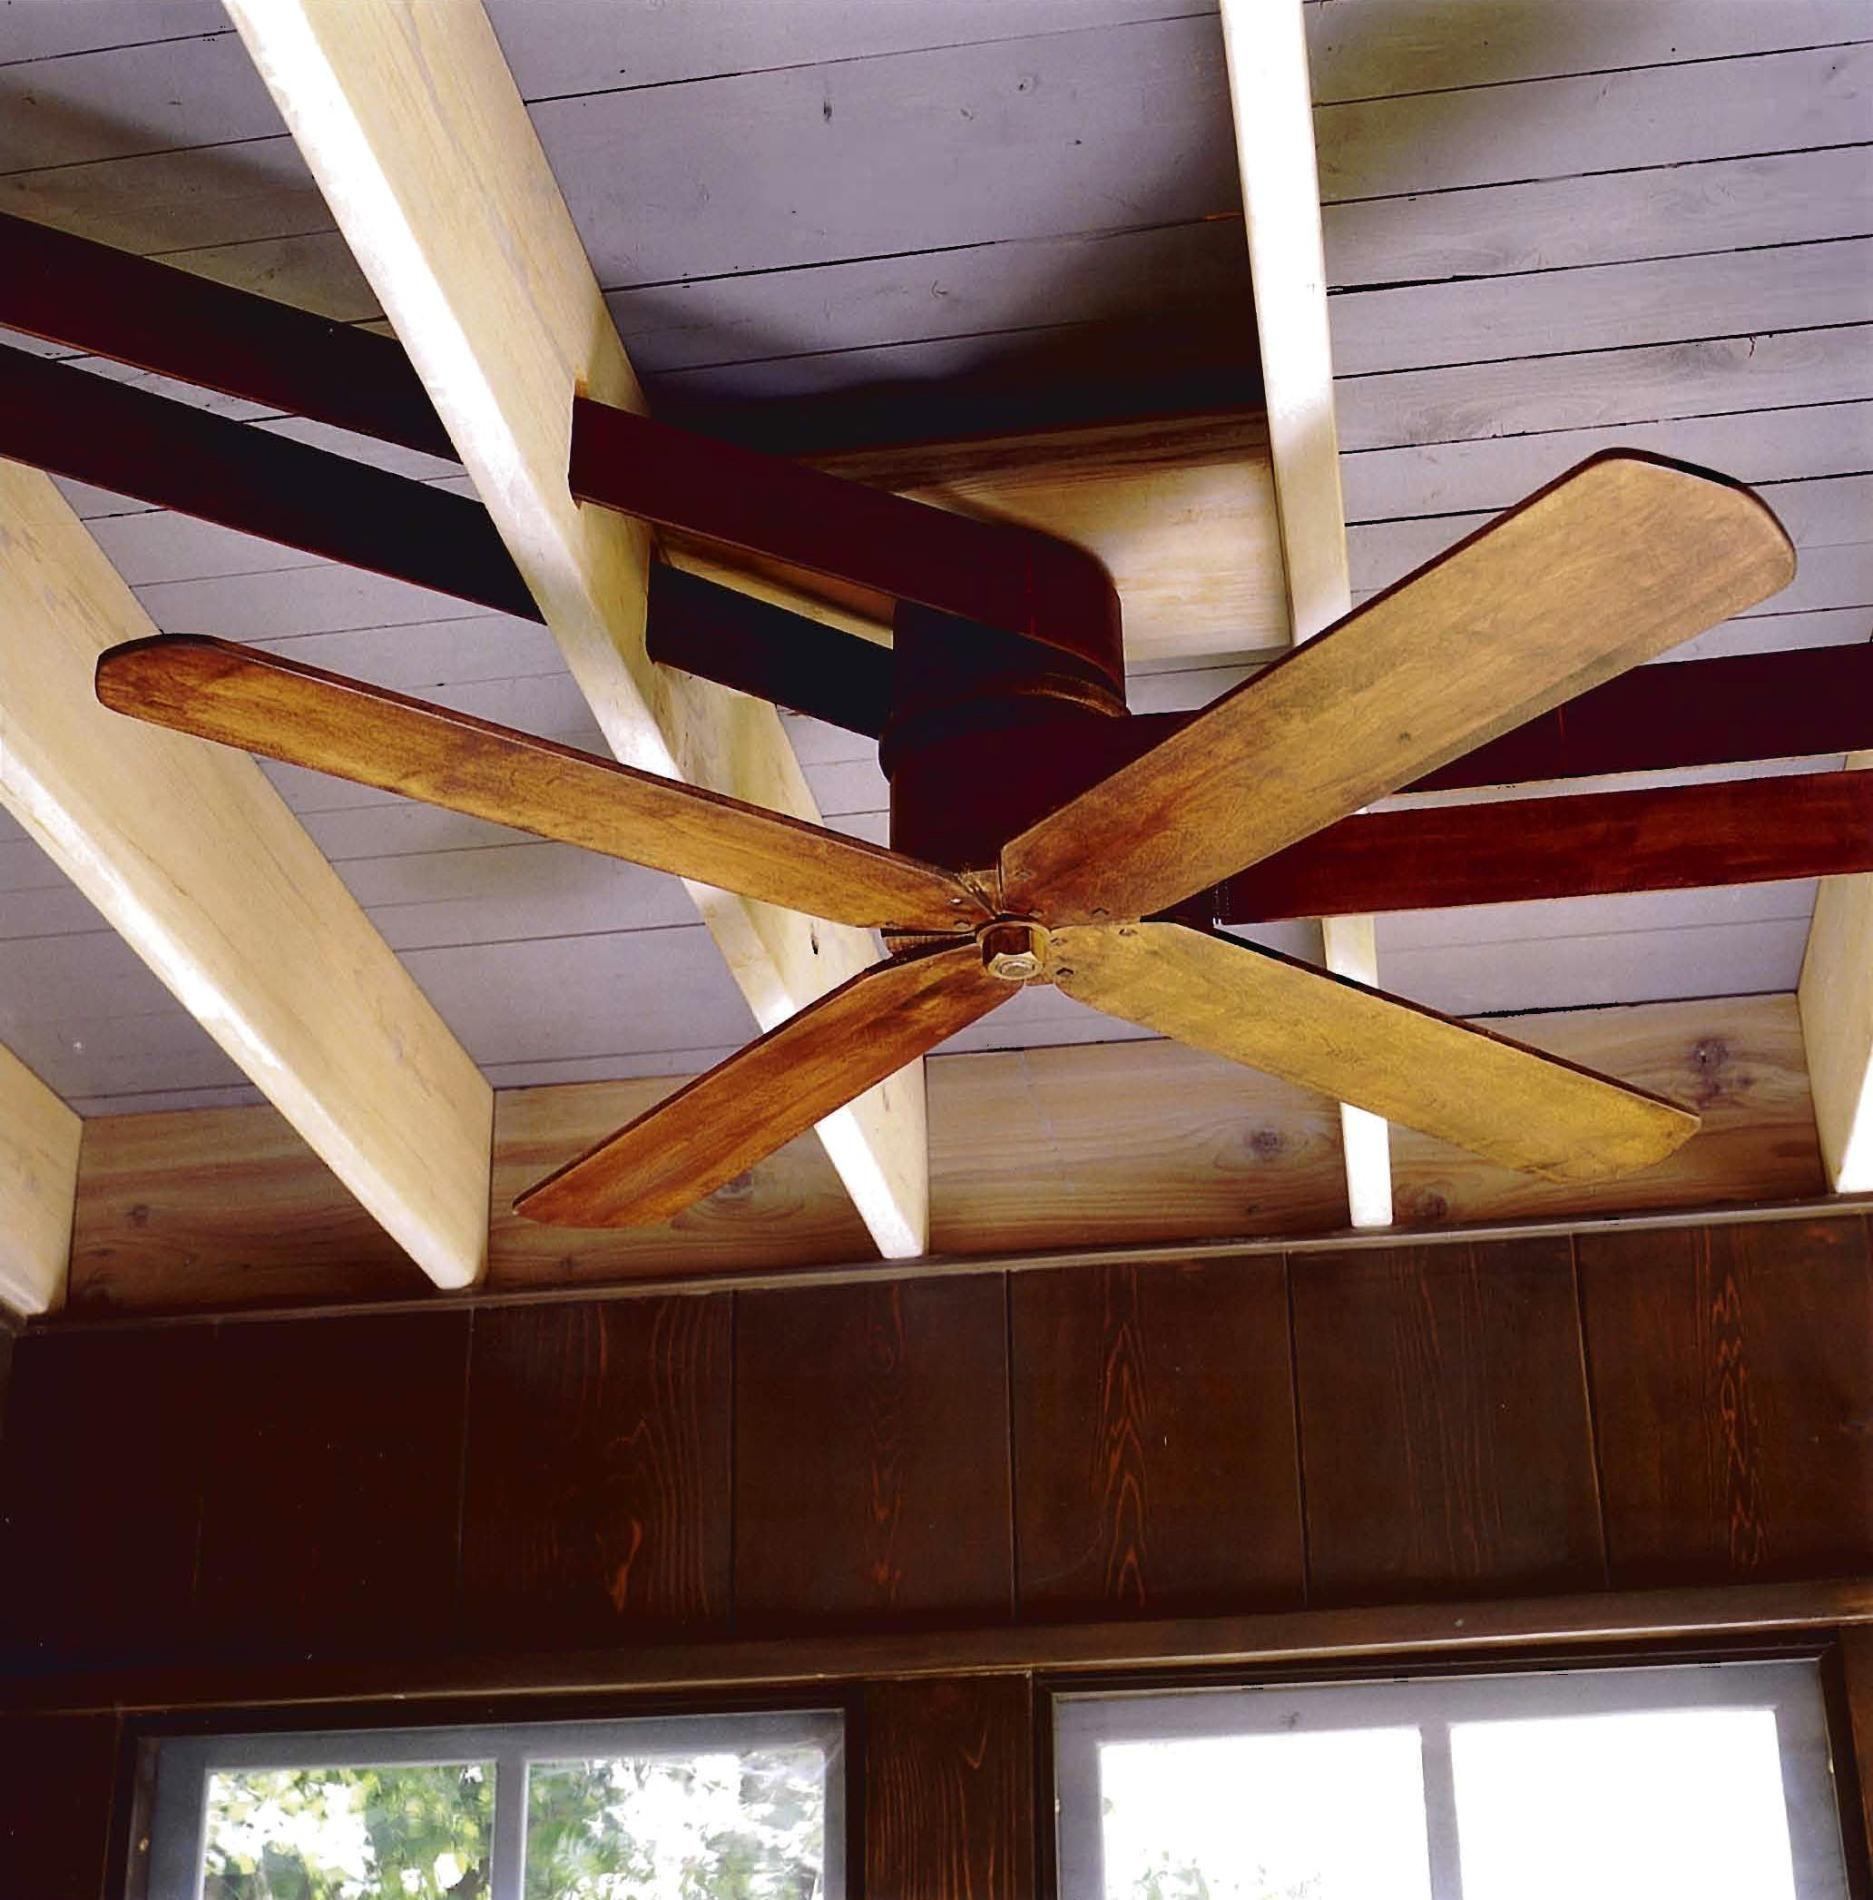 Exposed conduit ceiling fan Accessories LightingFixtures